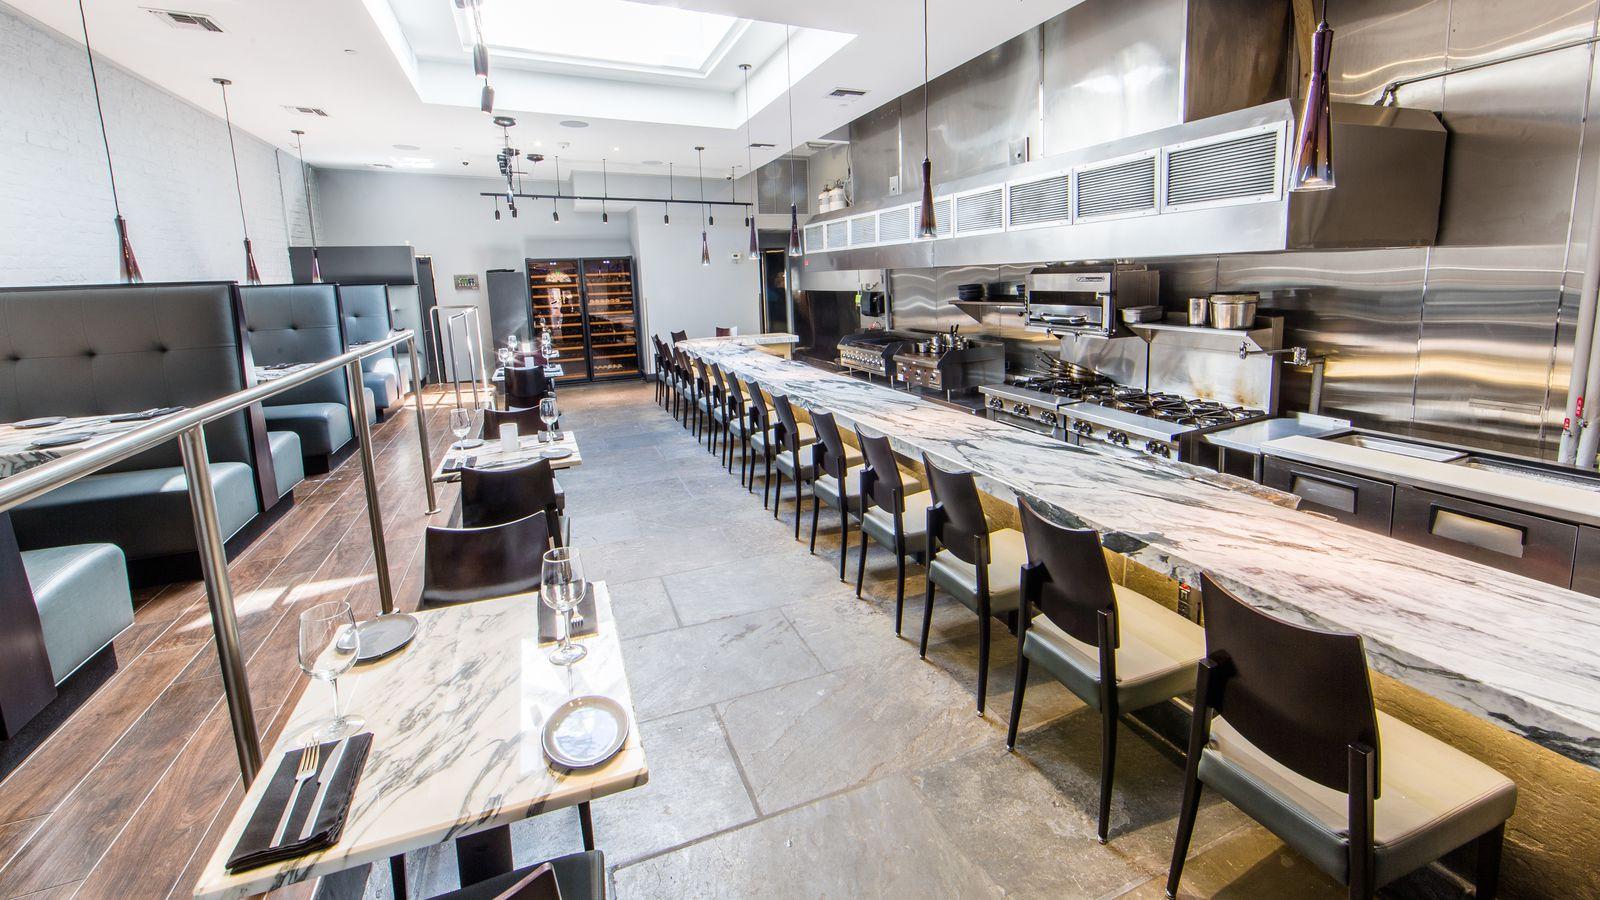 Peek inside a stunning 1 million renovation on decatur for Kitchen design 70115